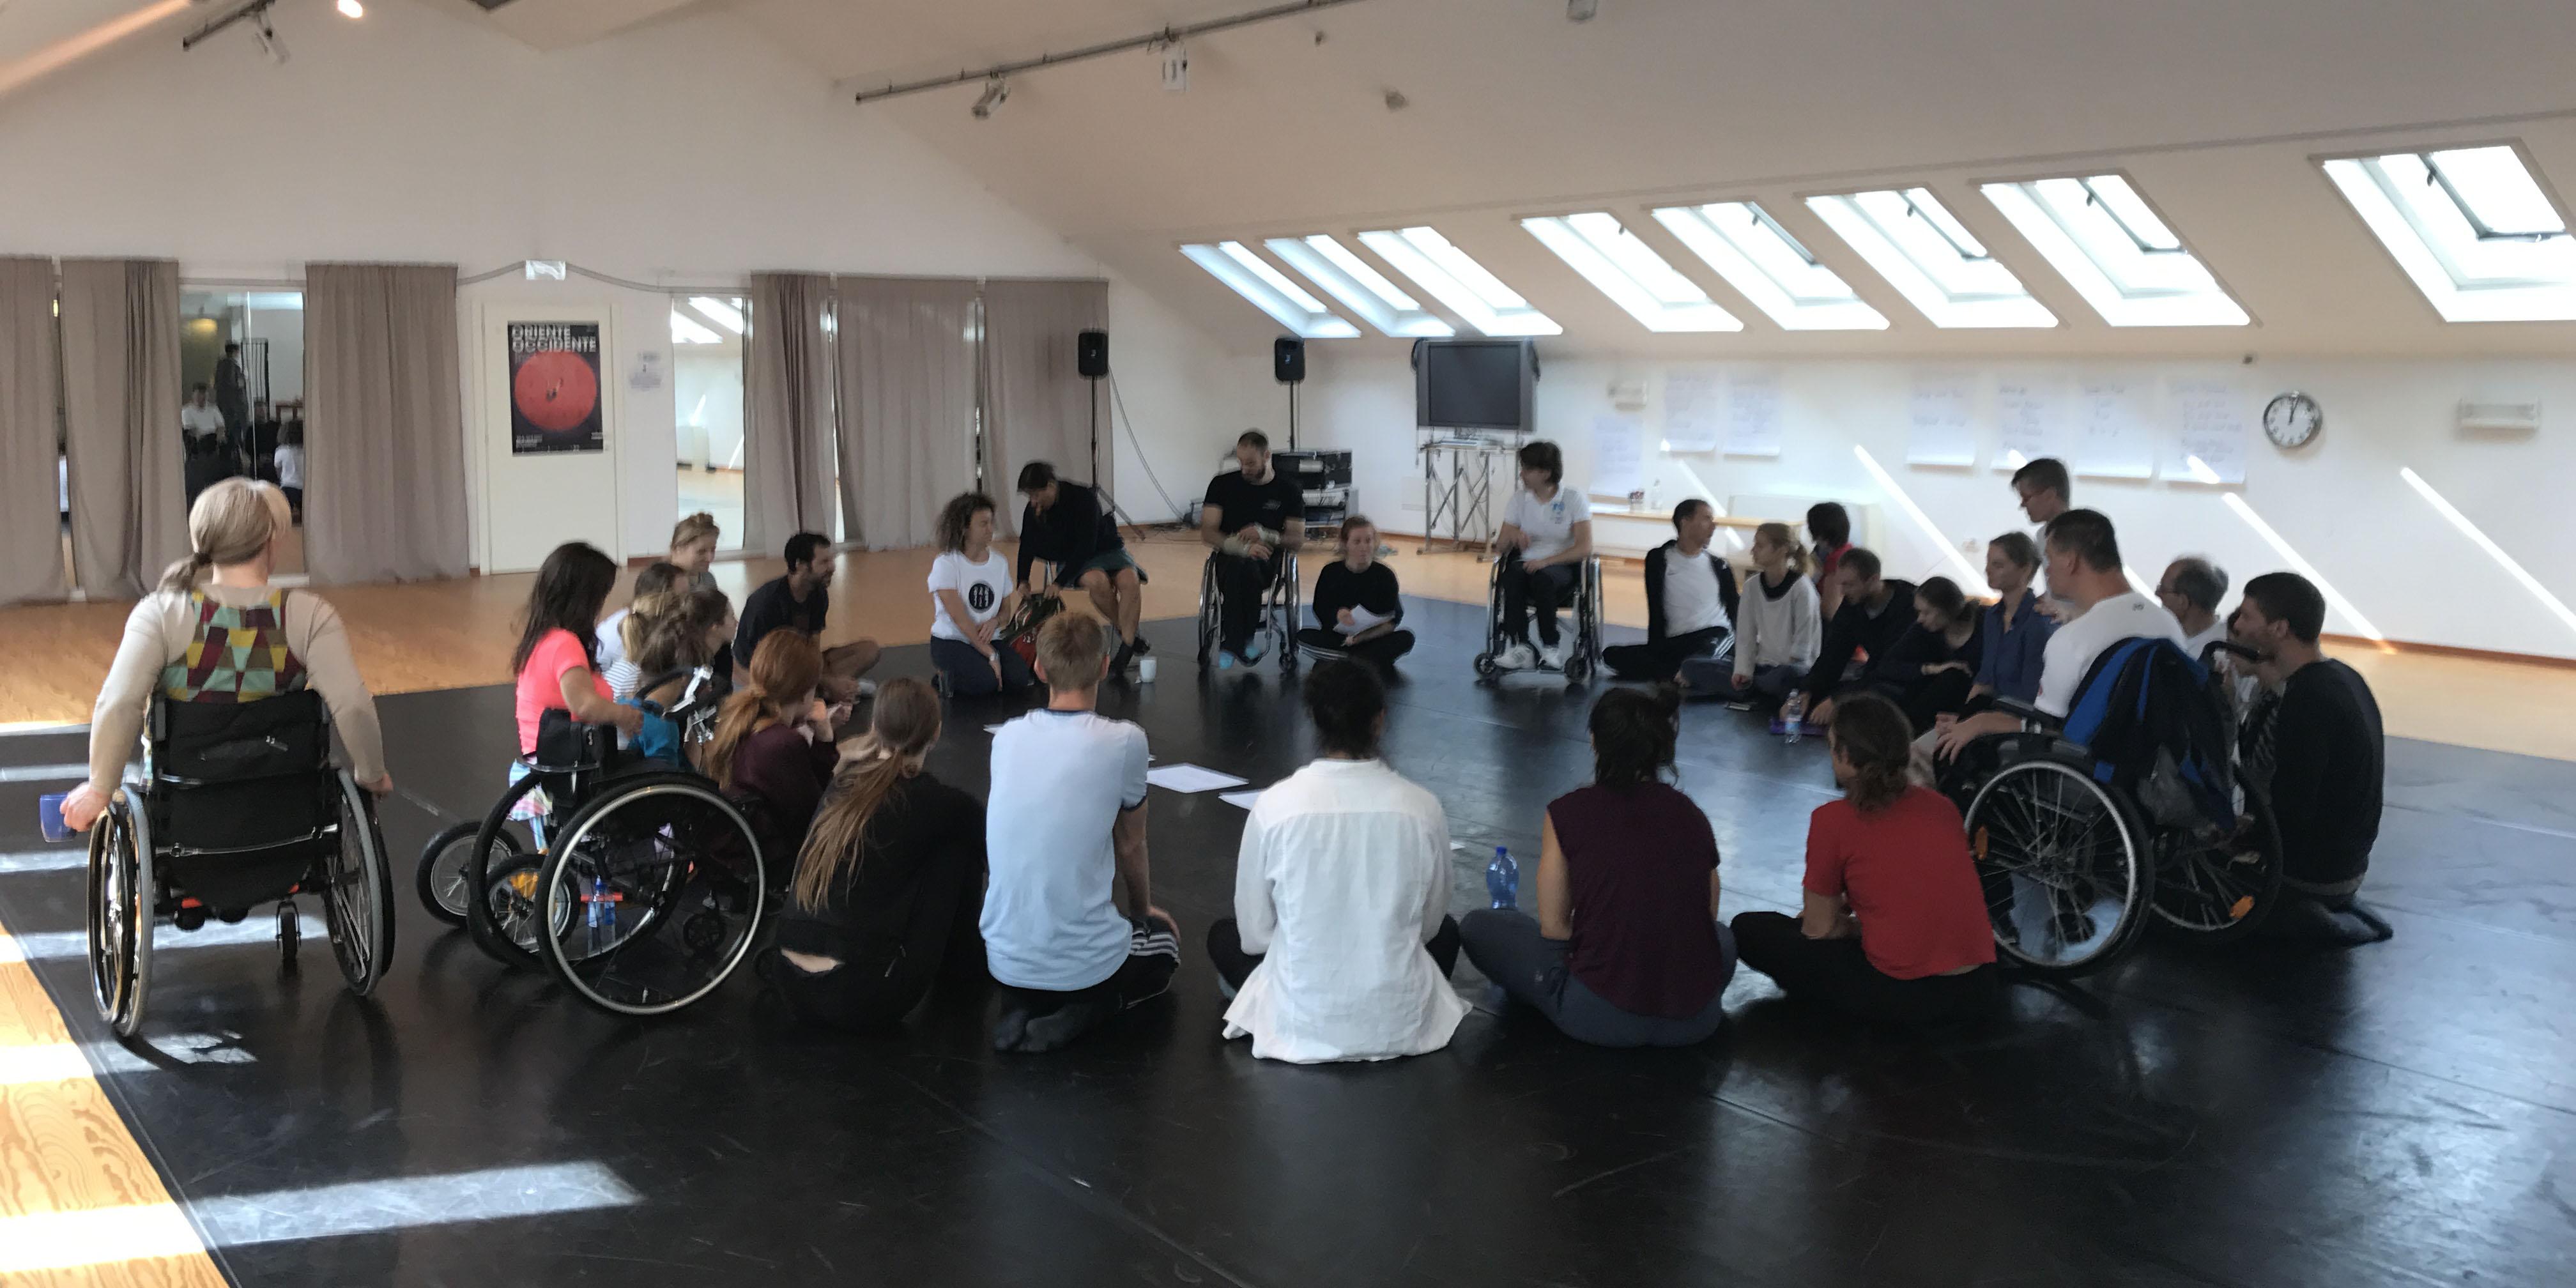 Bild från Rovereto Choreographic Lab i Rovereto, september 2017. Foto: Dag Rosenqvist